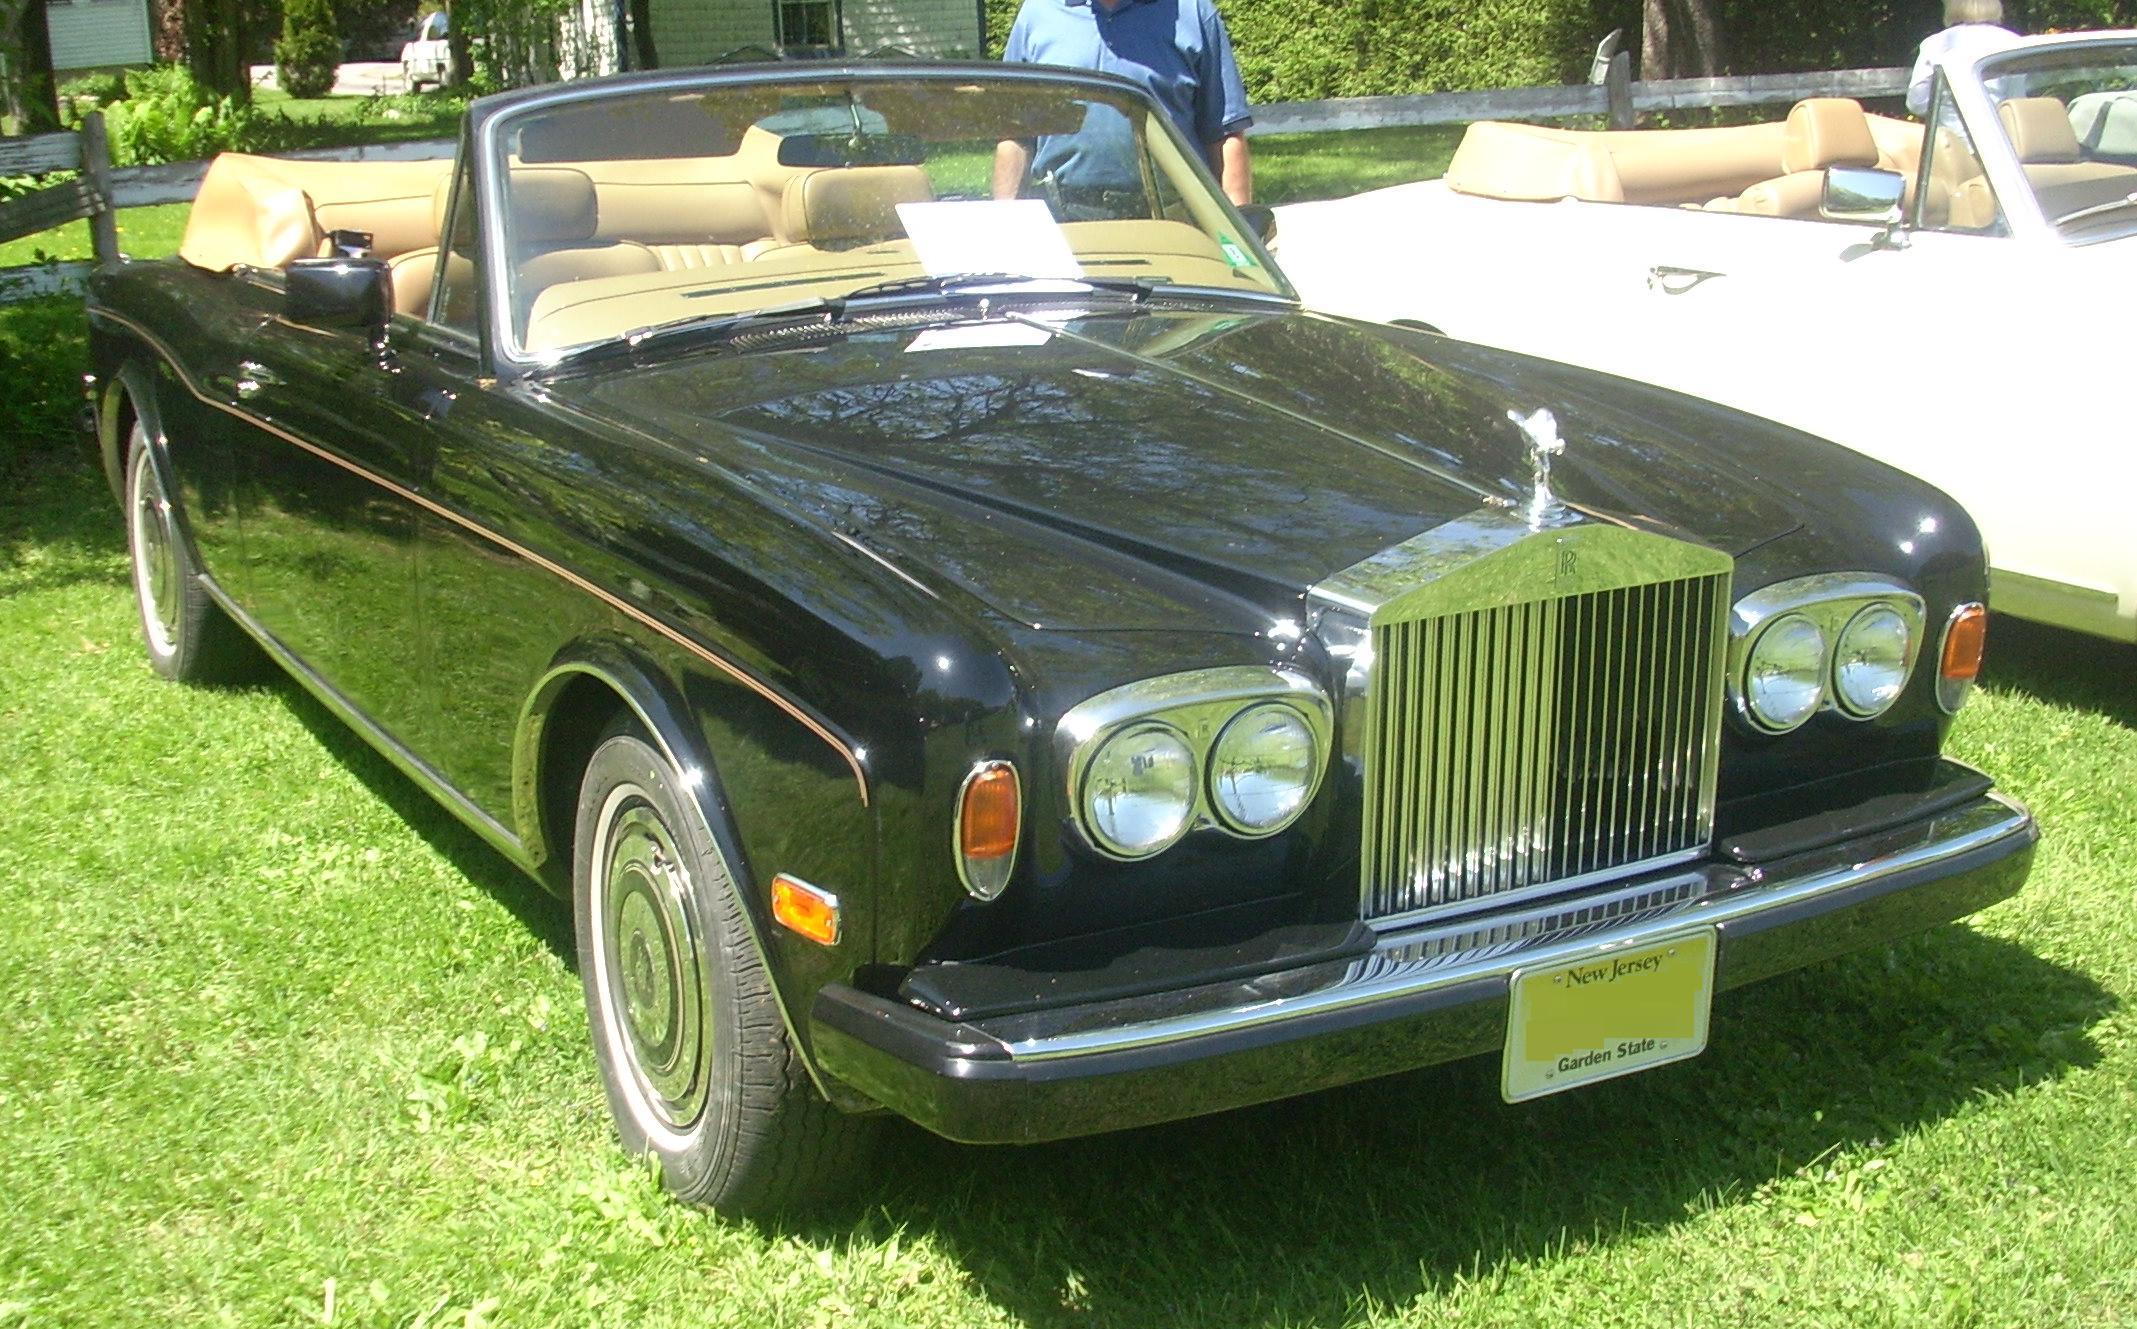 File:'88 Rolls-Royce Corniche Convertible (Hudson).JPG - Wikimedia